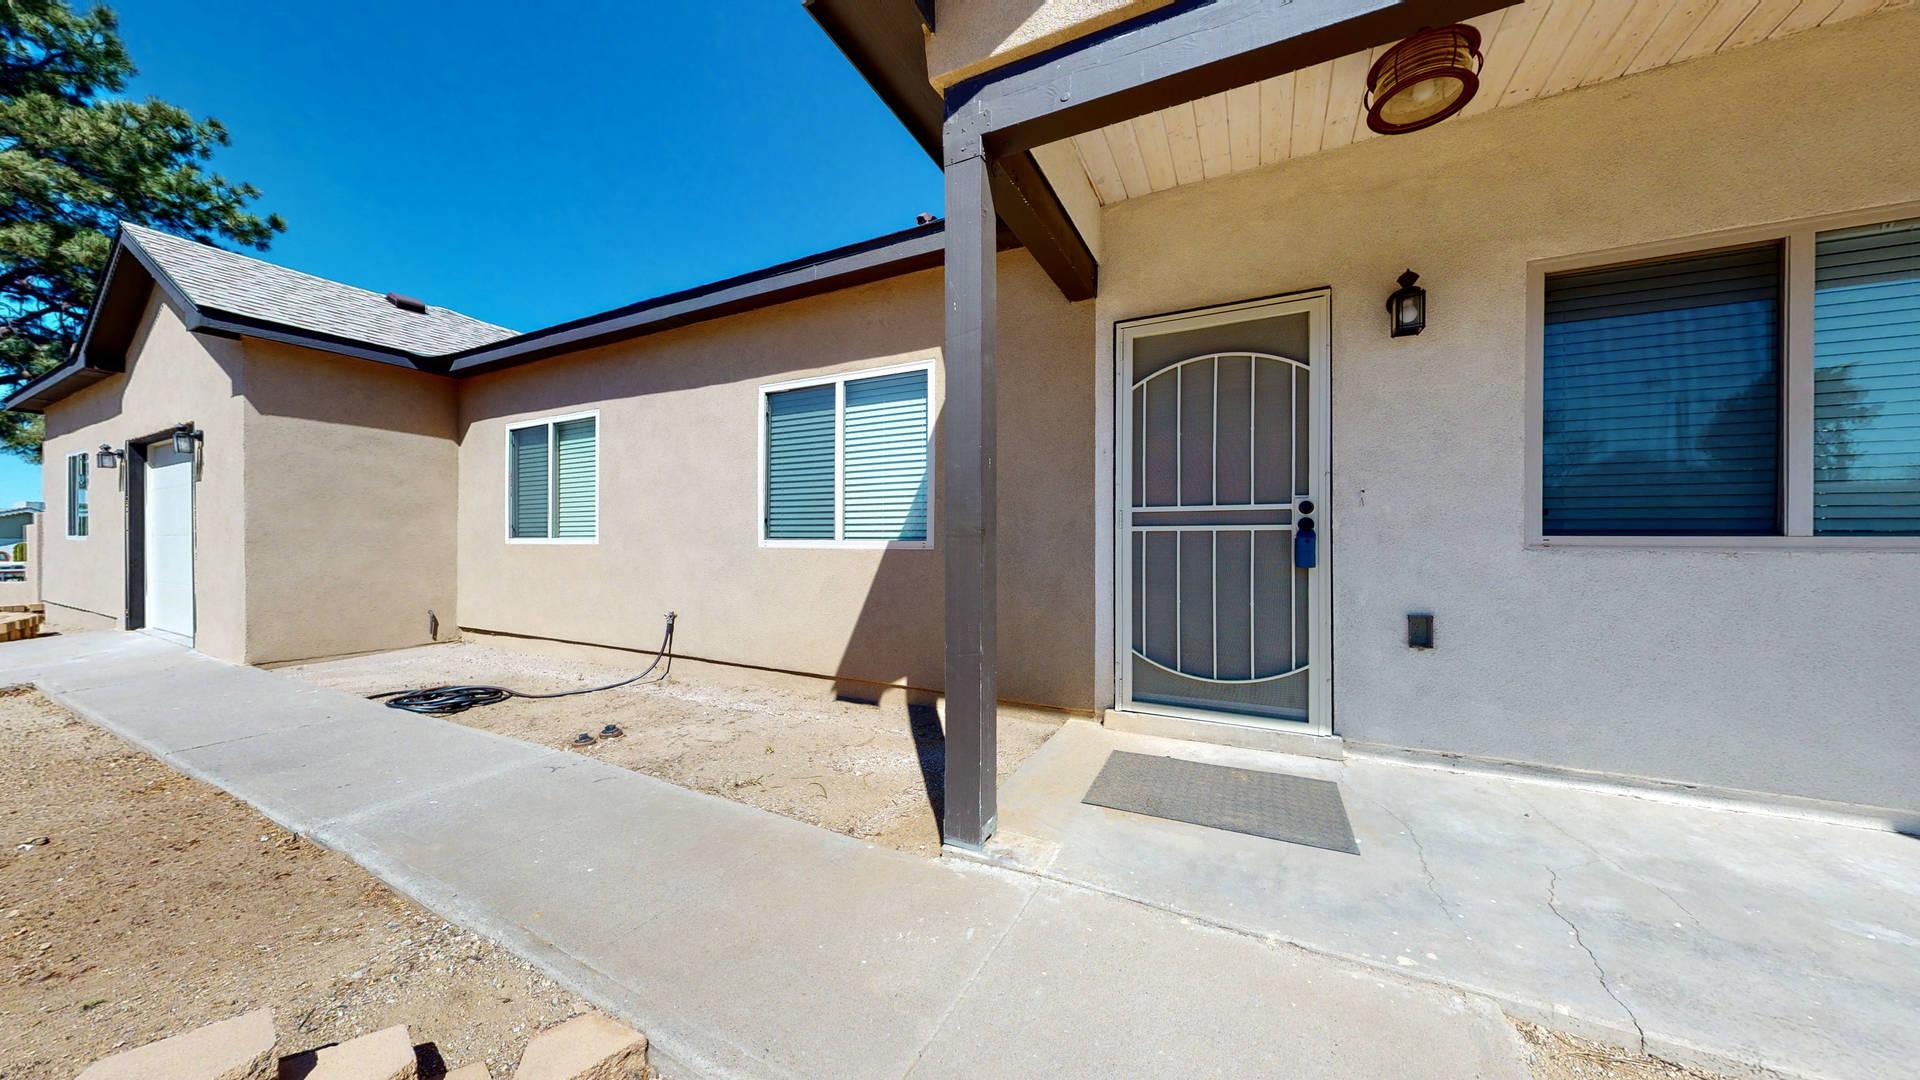 10201 Ellen Court Northeast Albuquerque, NM 87112